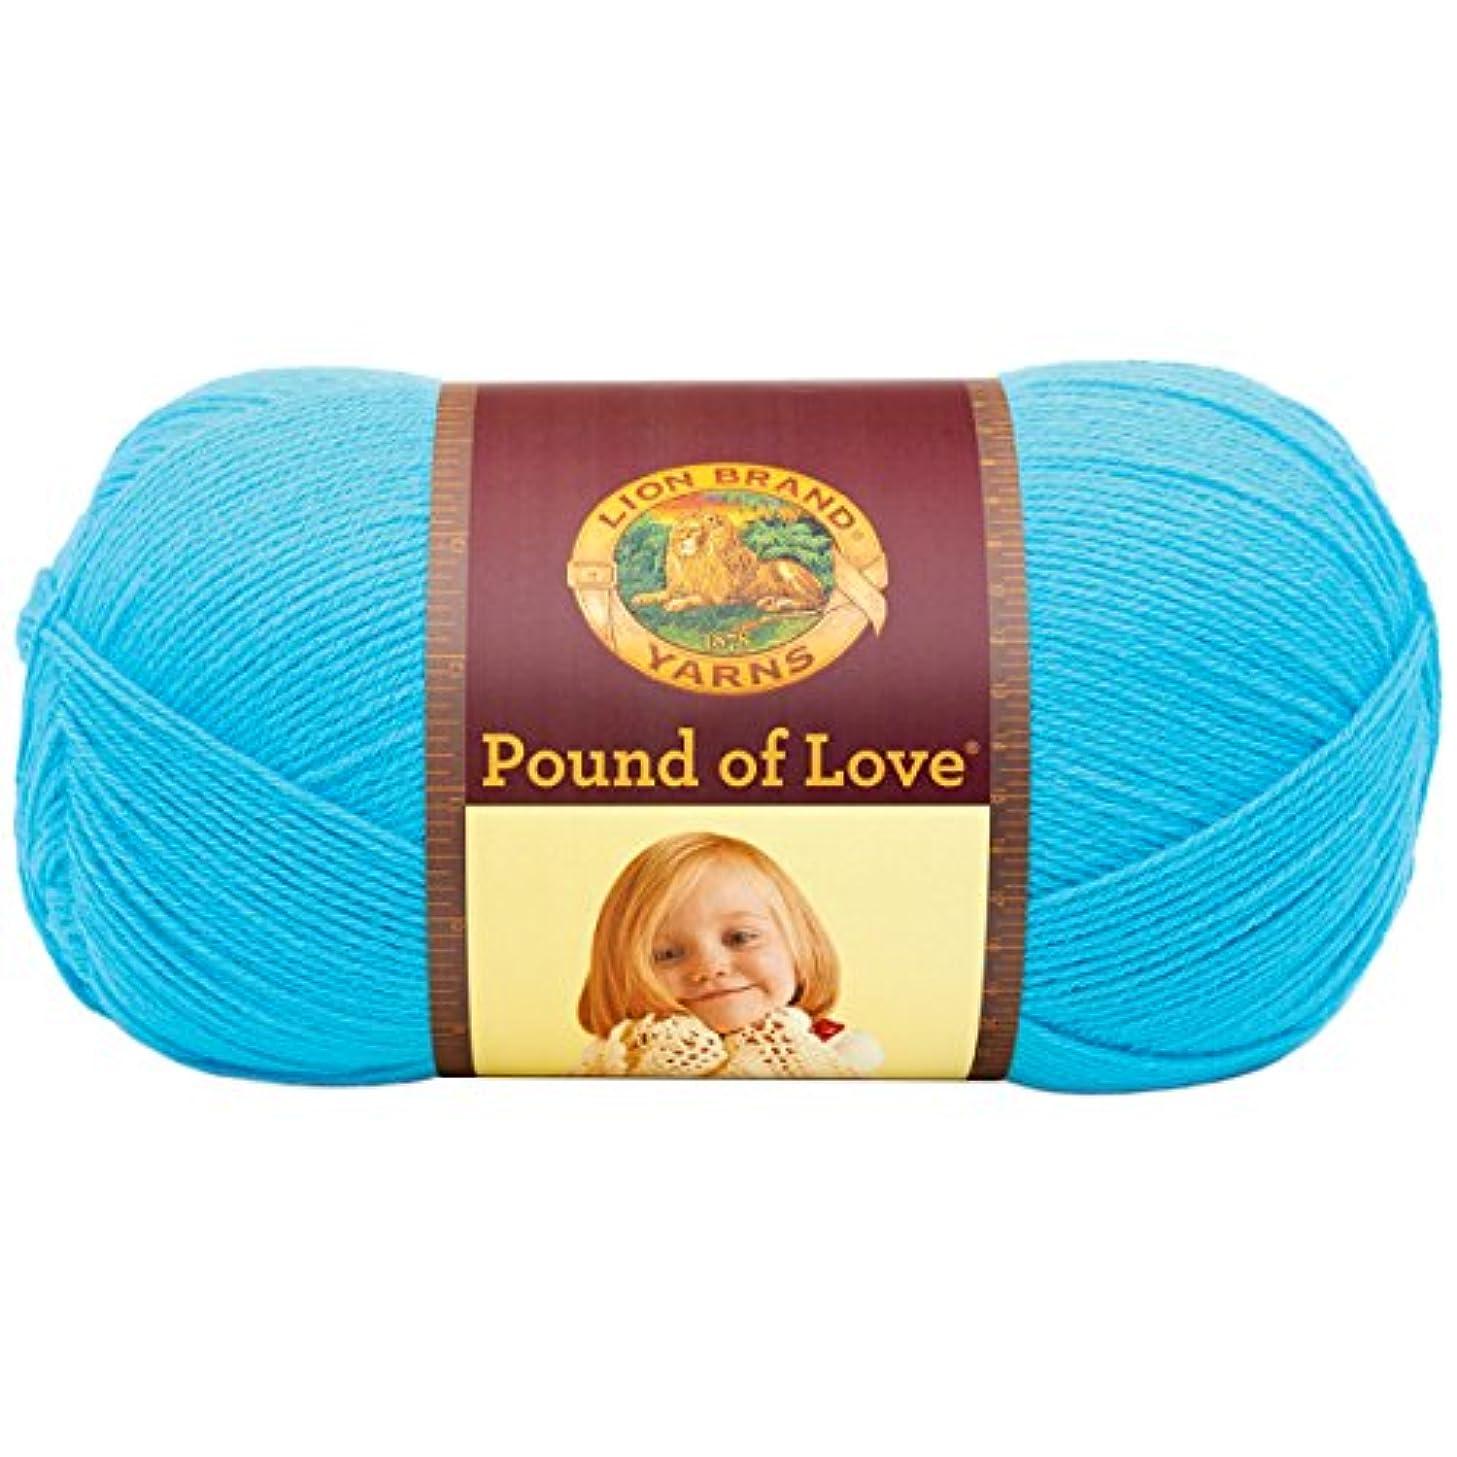 Lion Brand Yarn 550-148 Pound of Love Yarn, Turquoise, 16oz